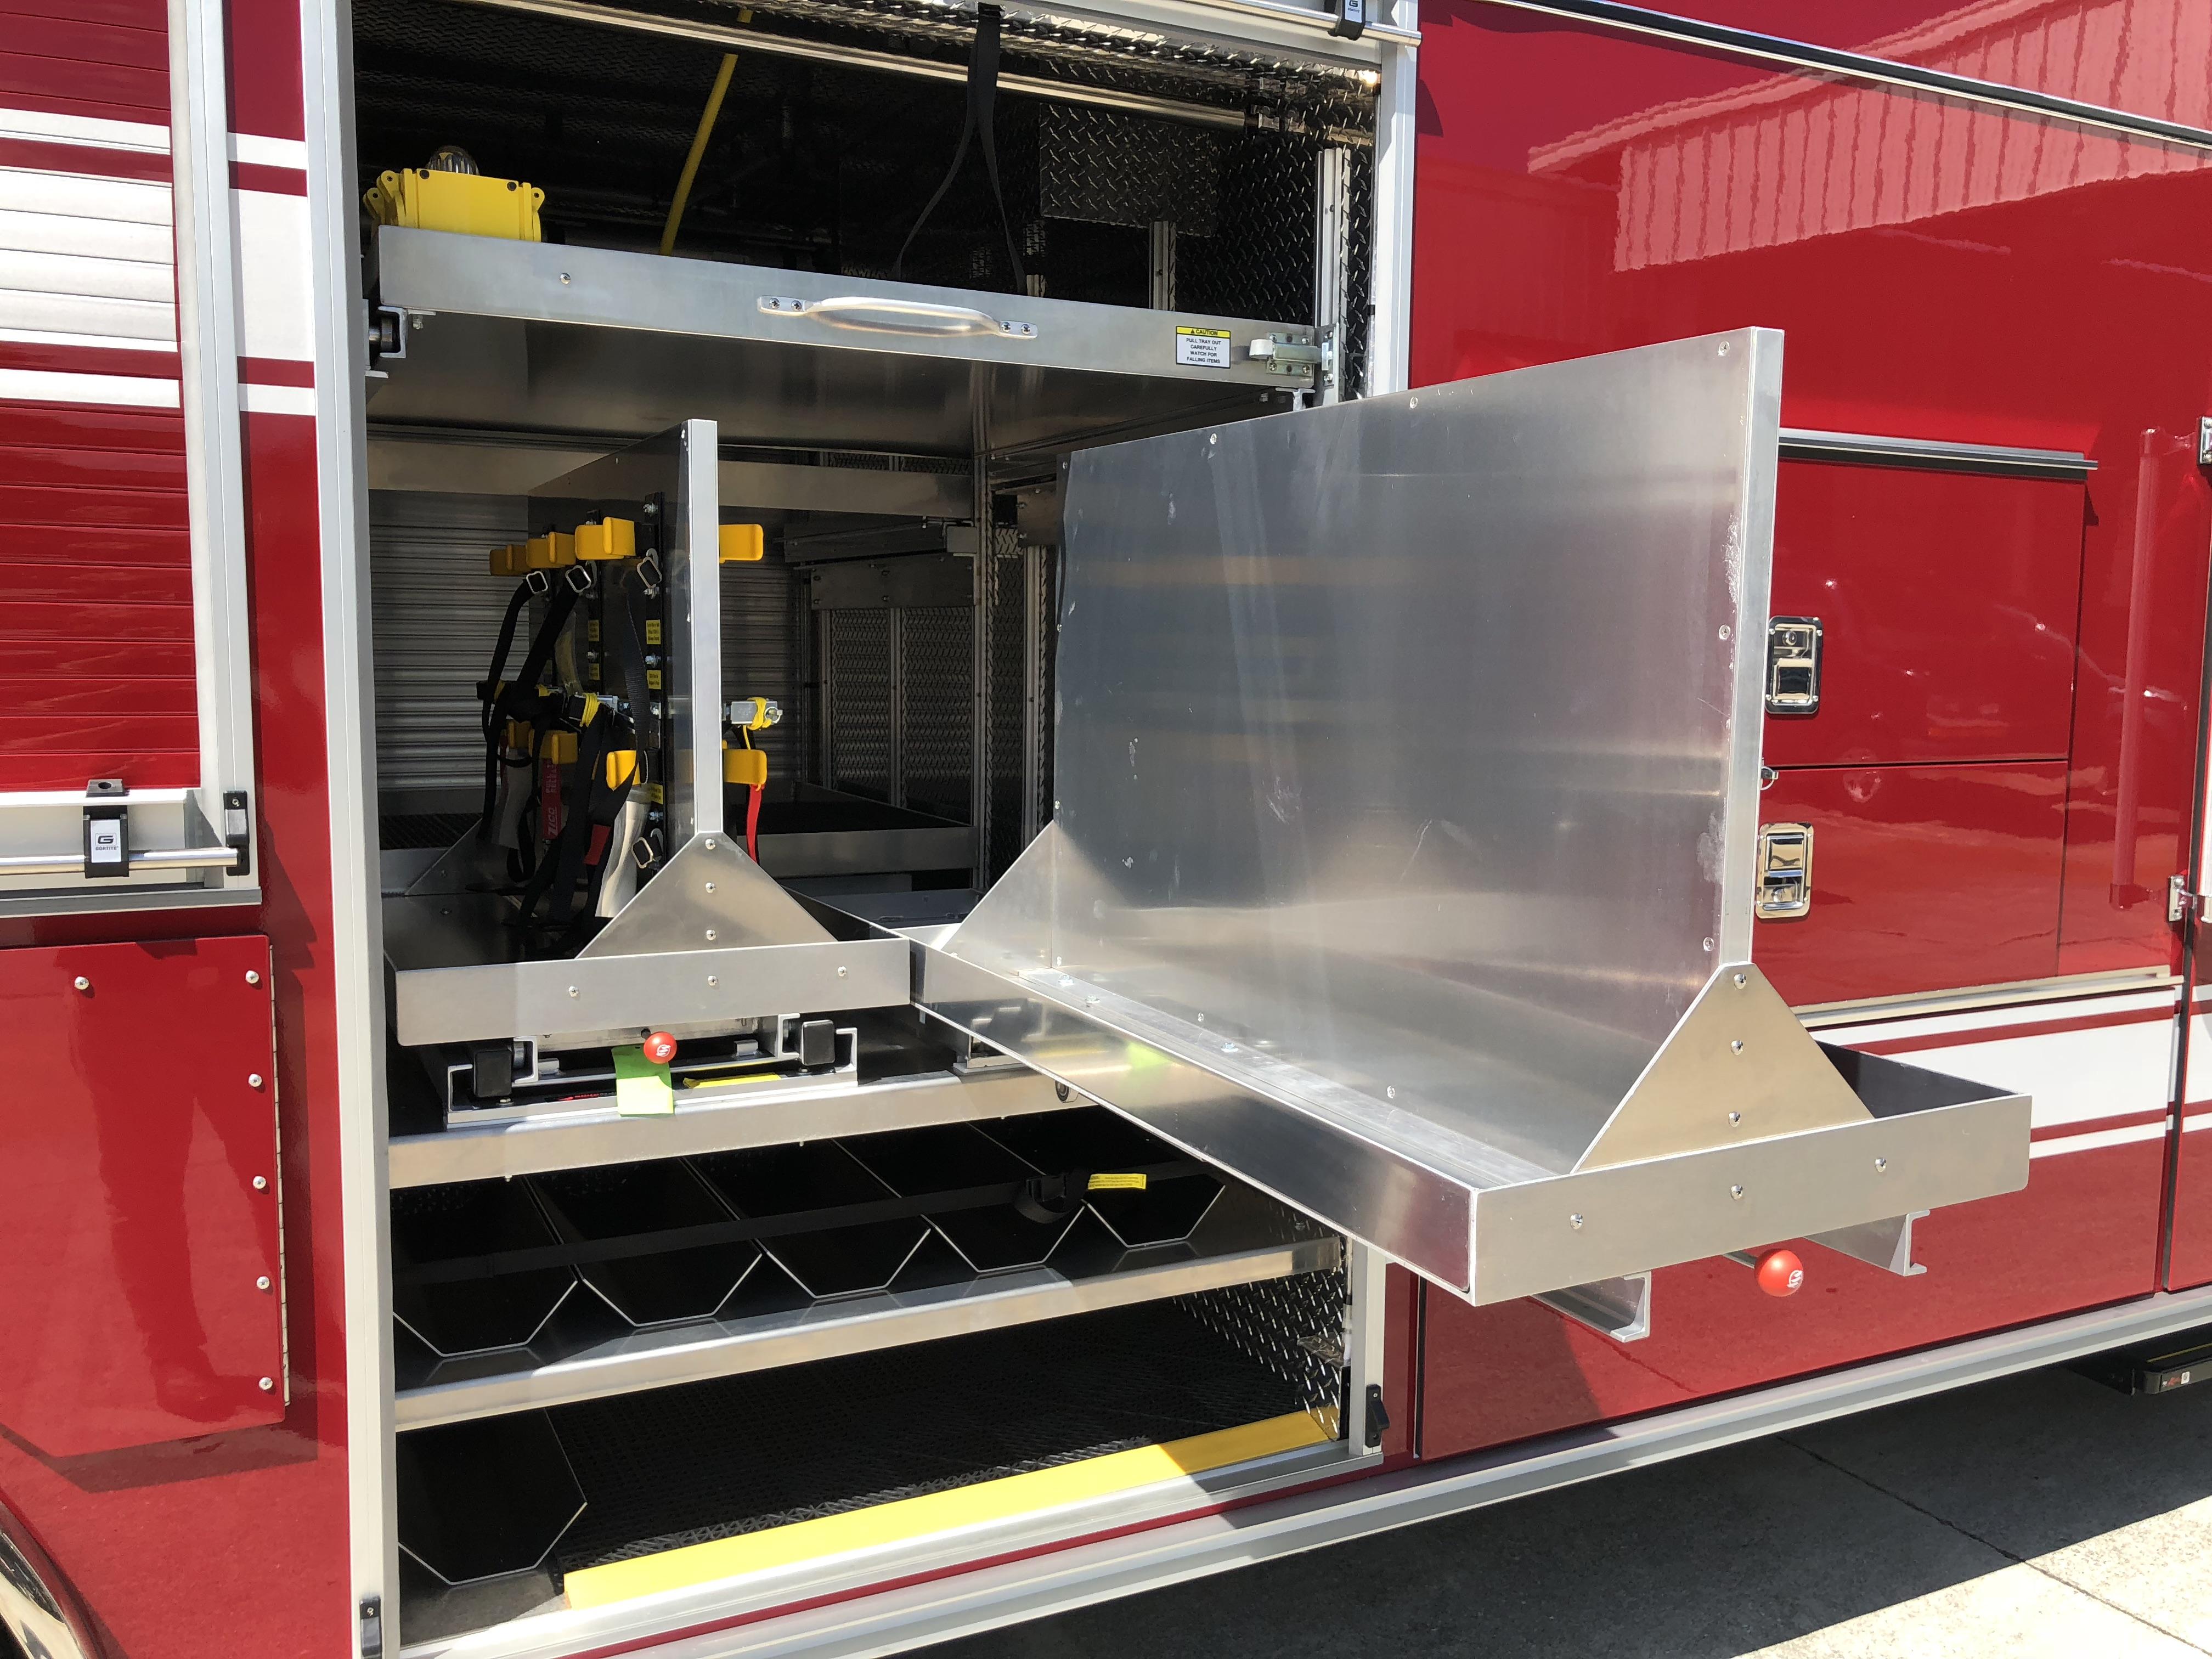 25-Ft. Crew Body Haz-Mat Rescue